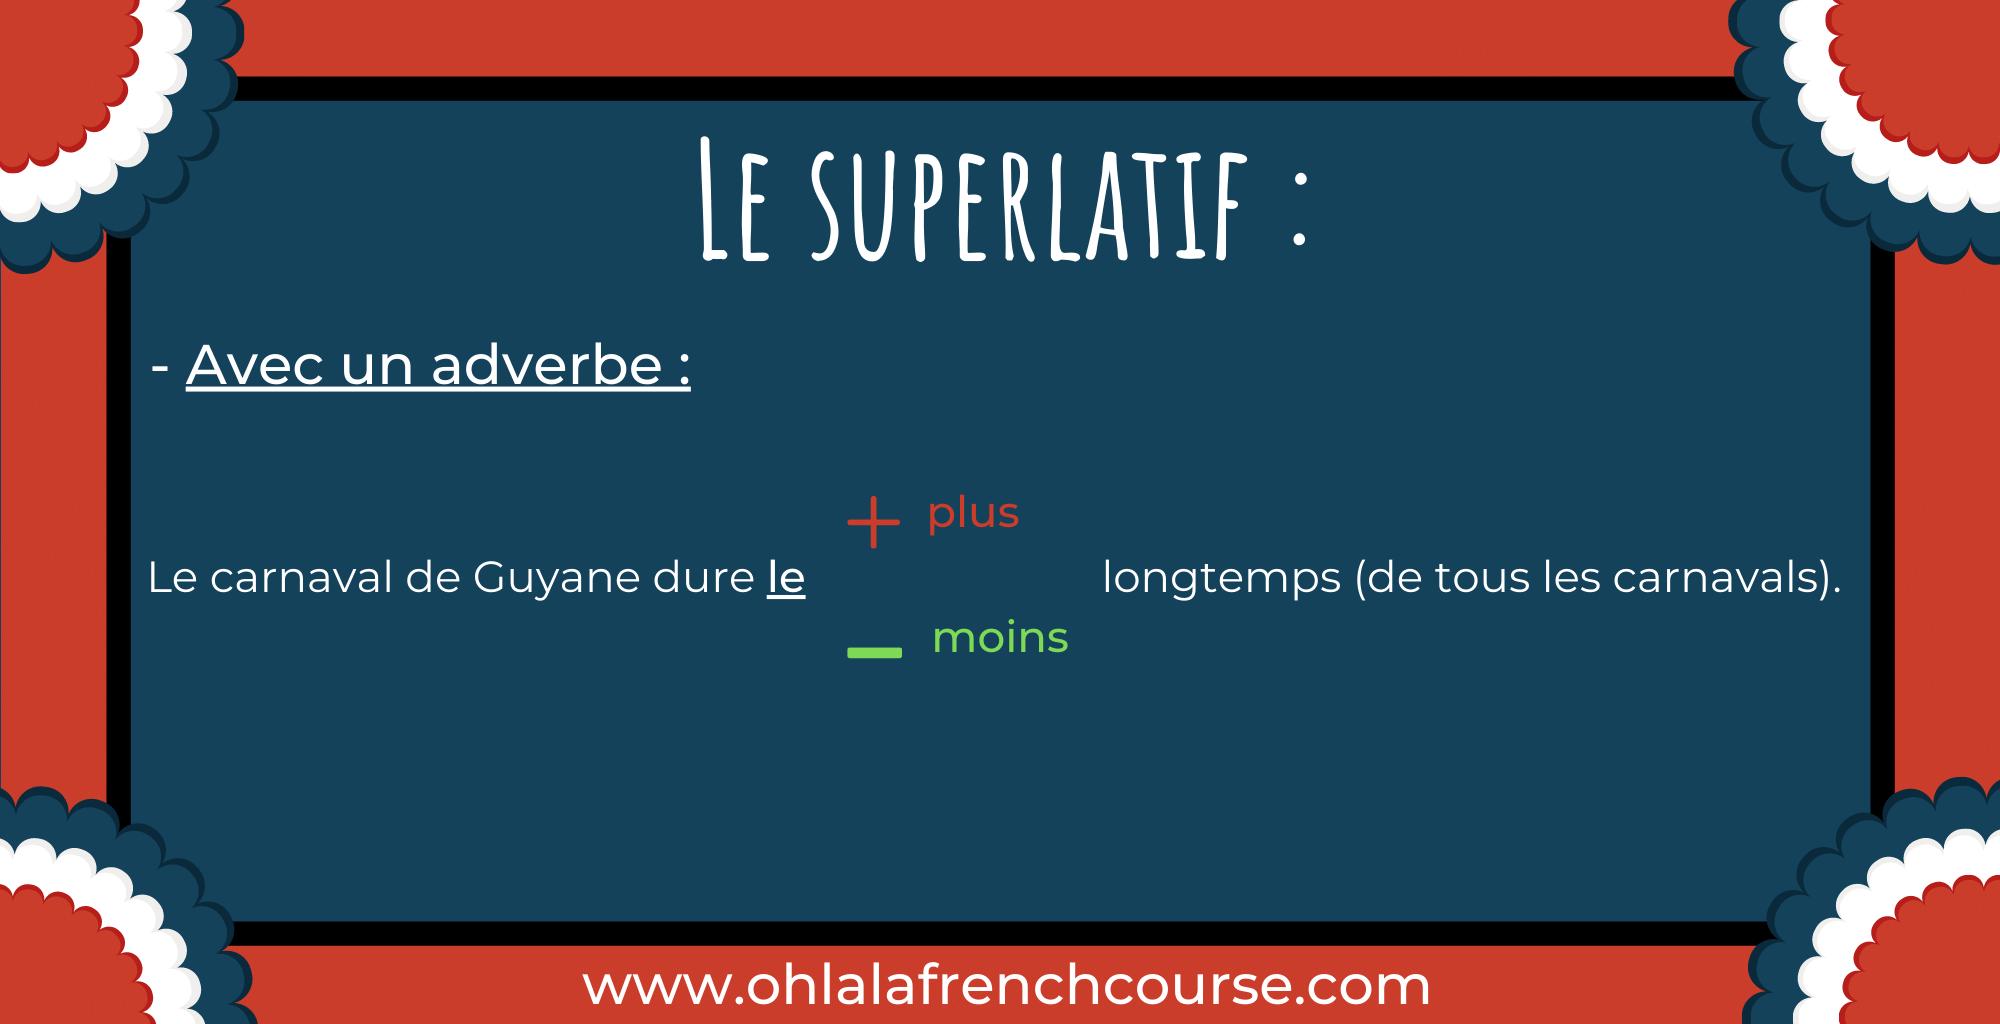 Le superlatif - Lesuperlatif avec un adverbe